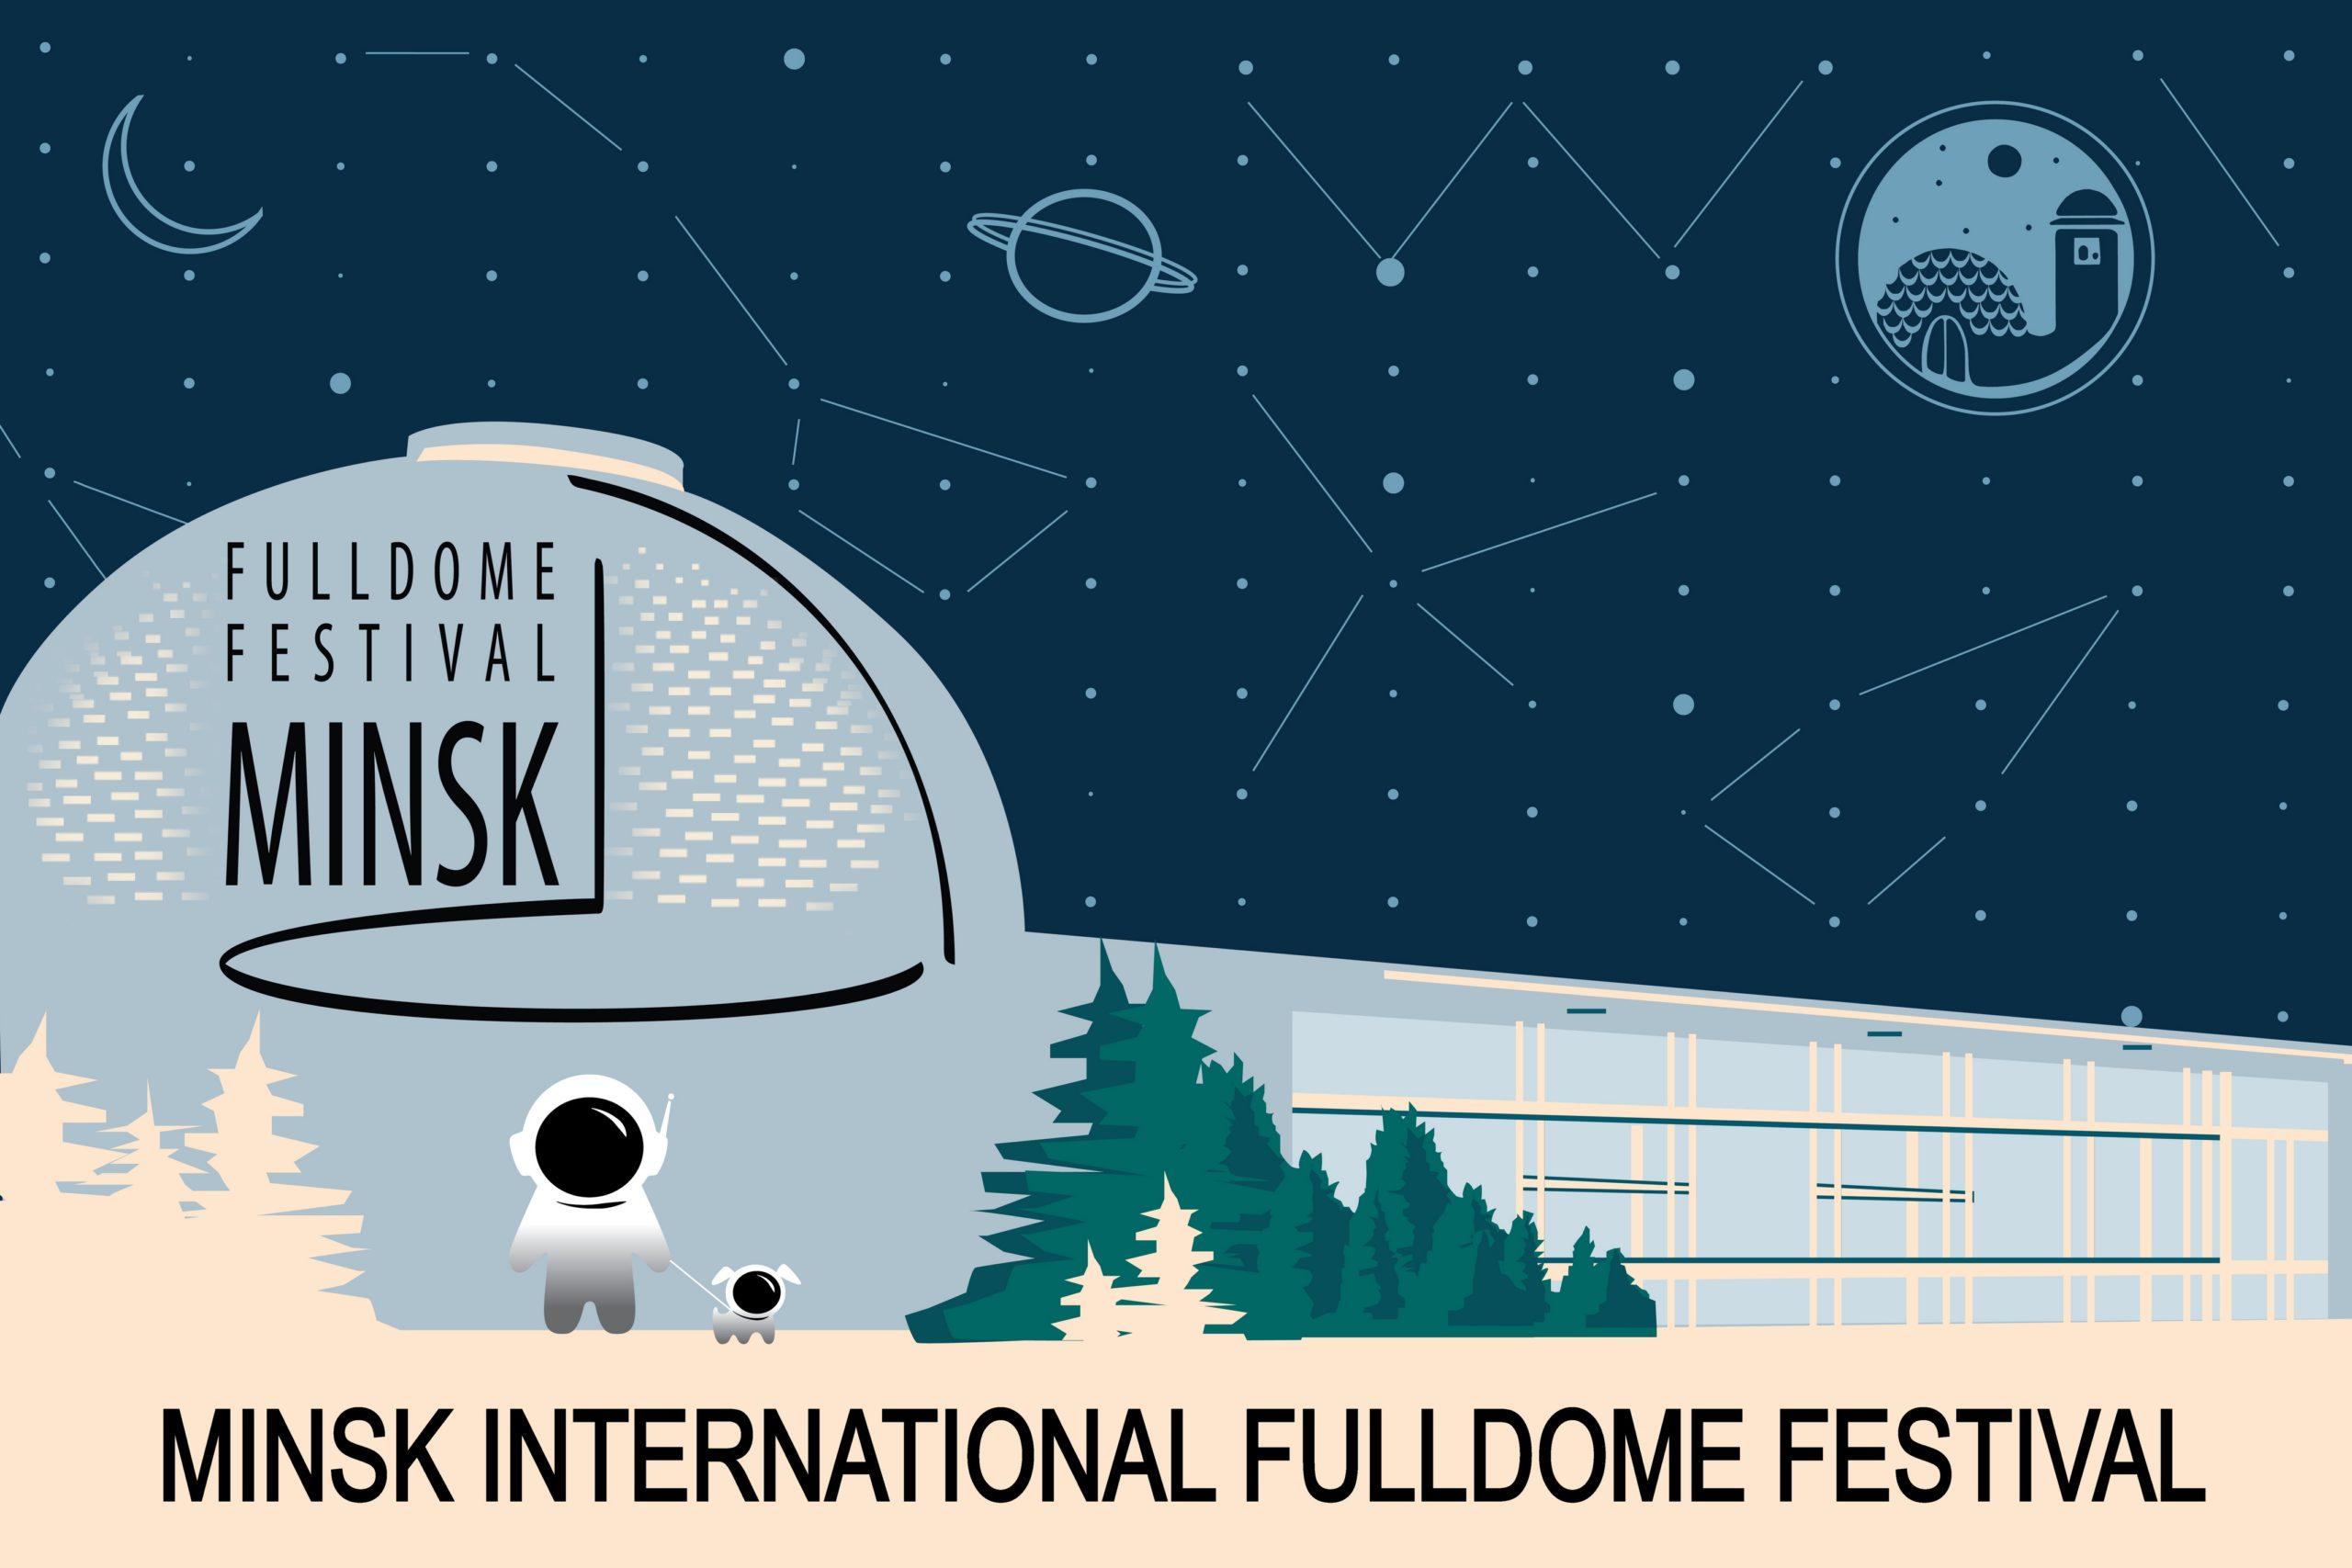 img news fulldome minsk-international-fulldome-festival-2020-cancelled